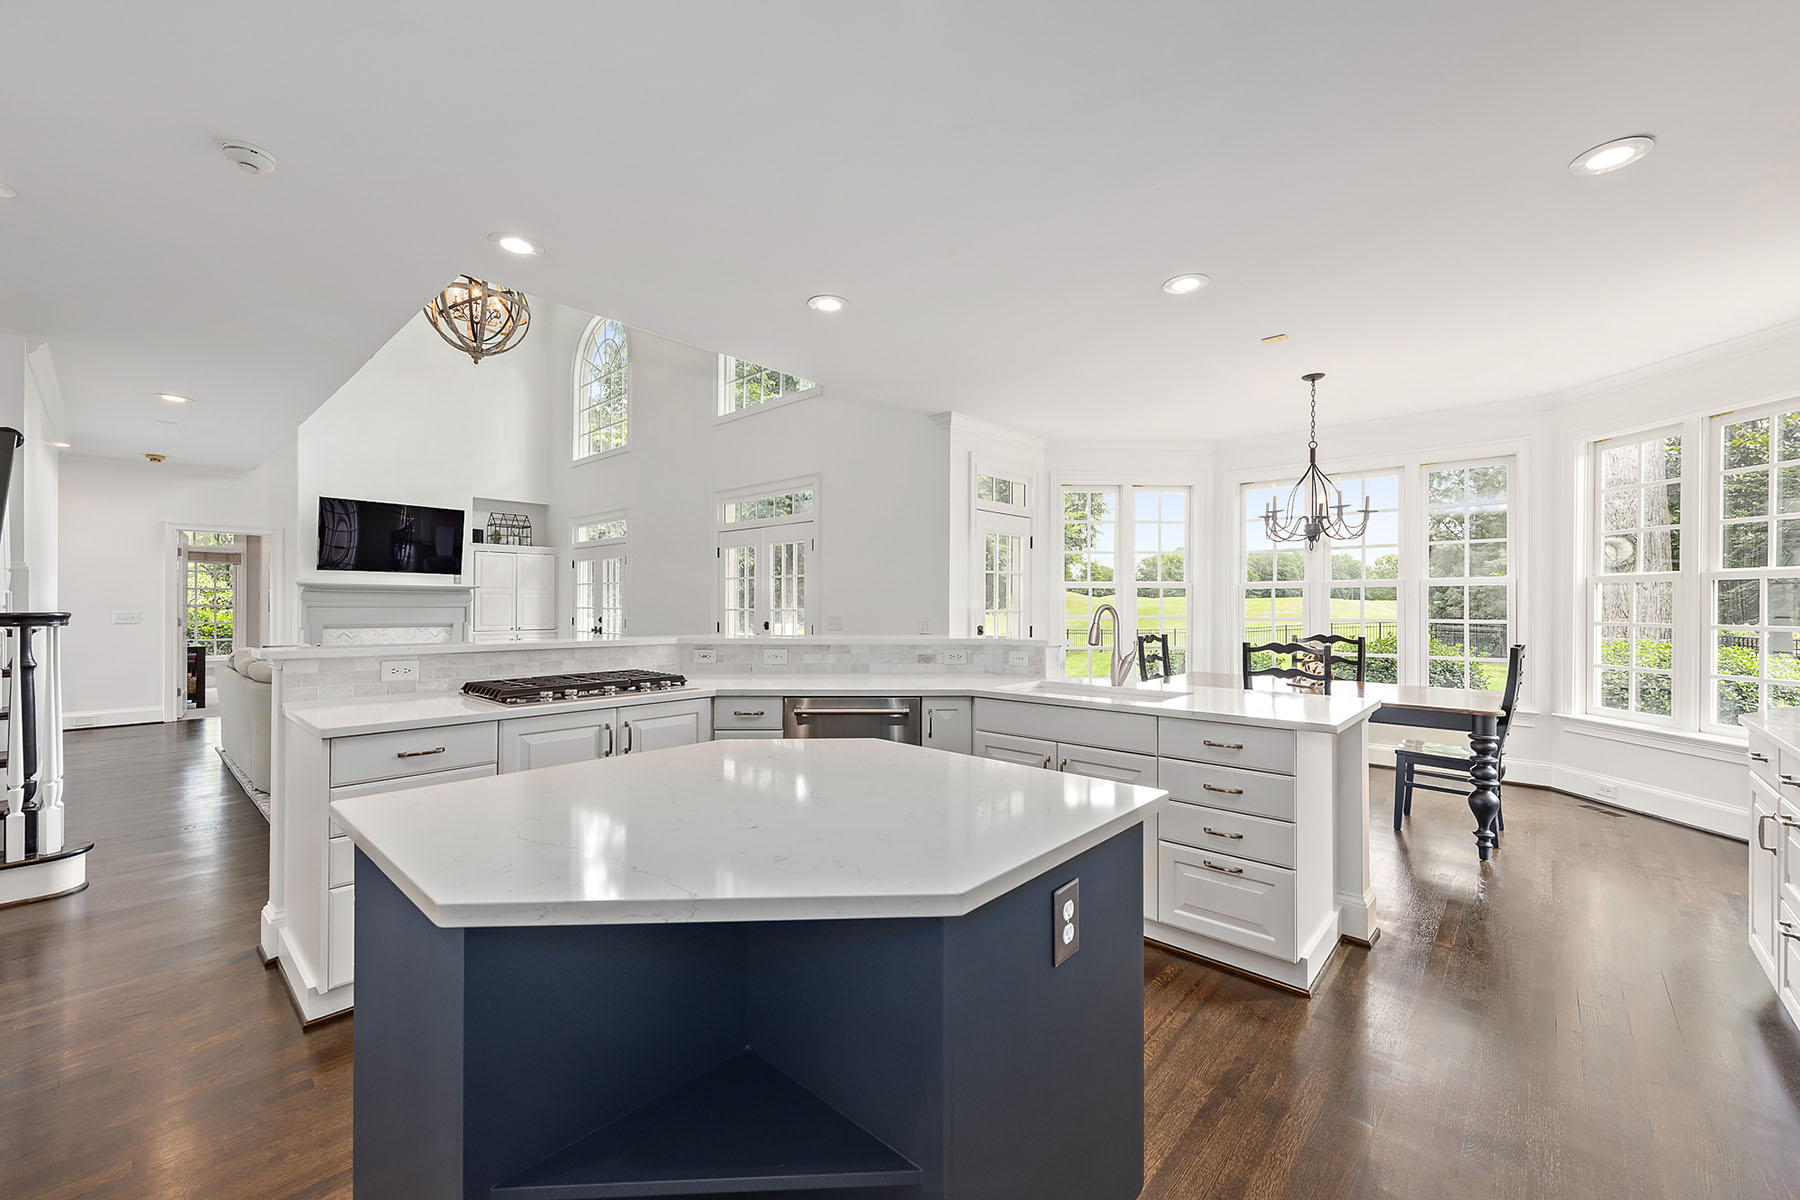 Additional photo for property listing at THE PENINSULA 18524 Peninsula Club Dr, Cornelius, North Carolina 28031 United States